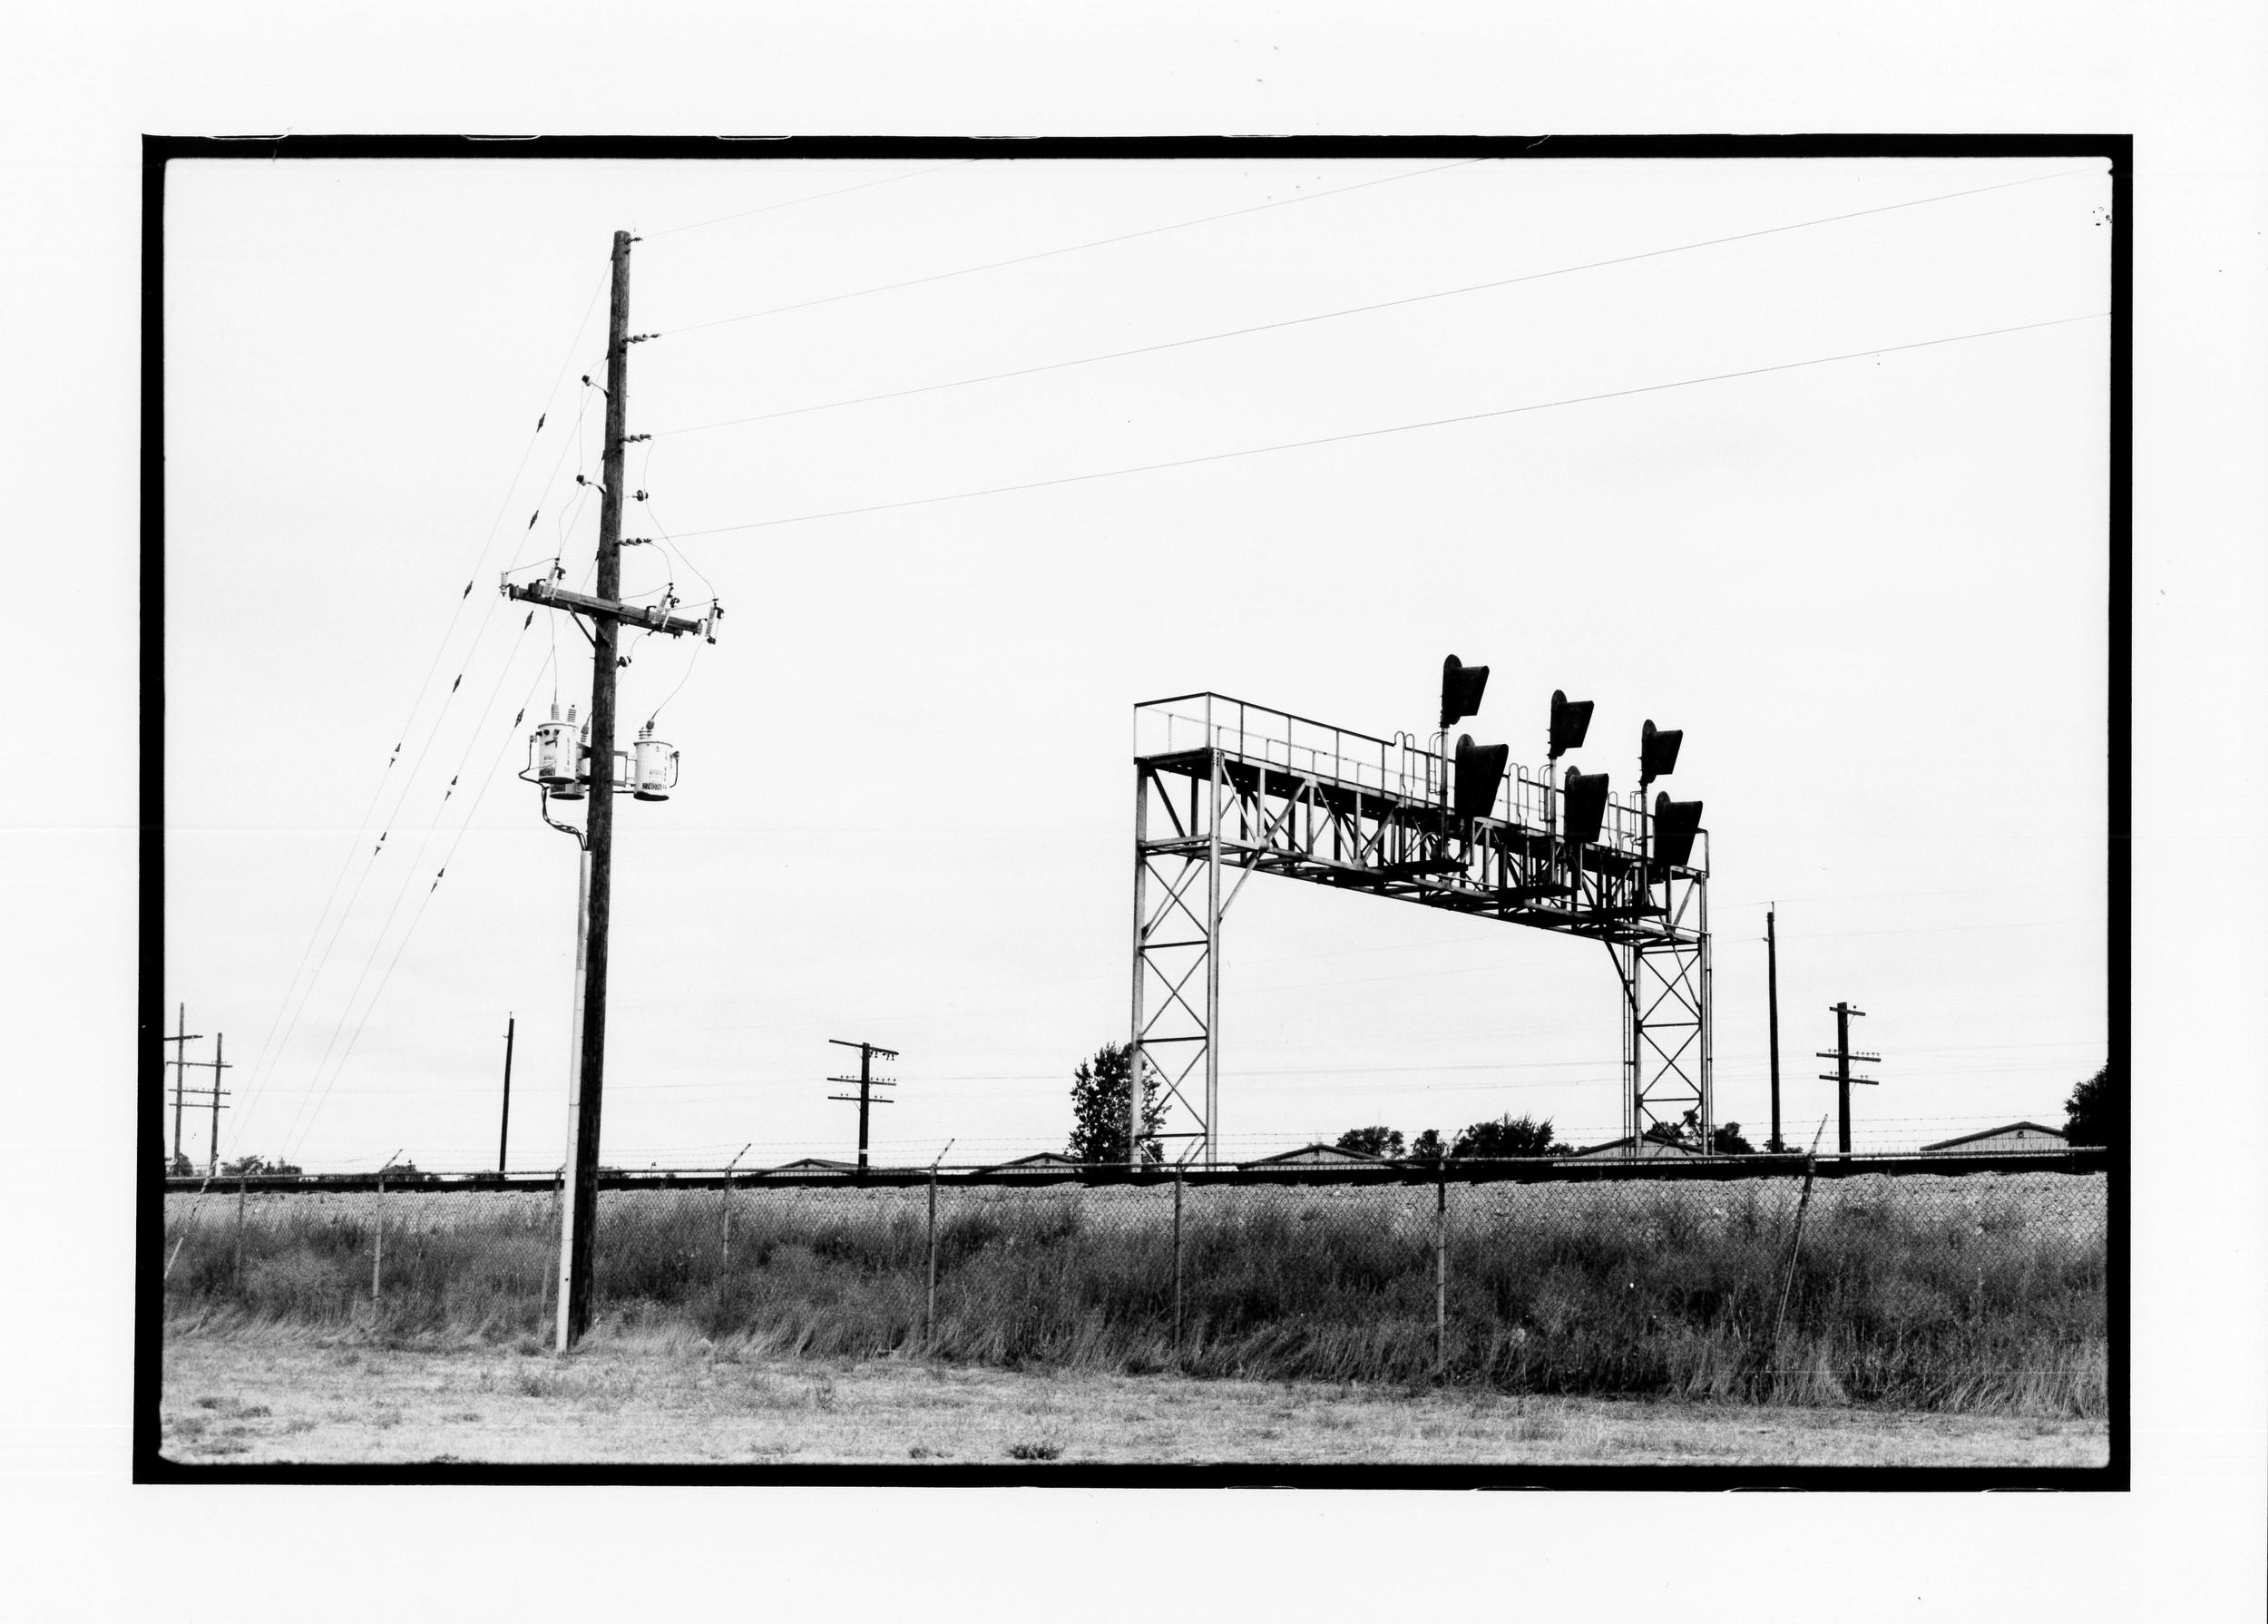 Train tracks, Wyoming 2010